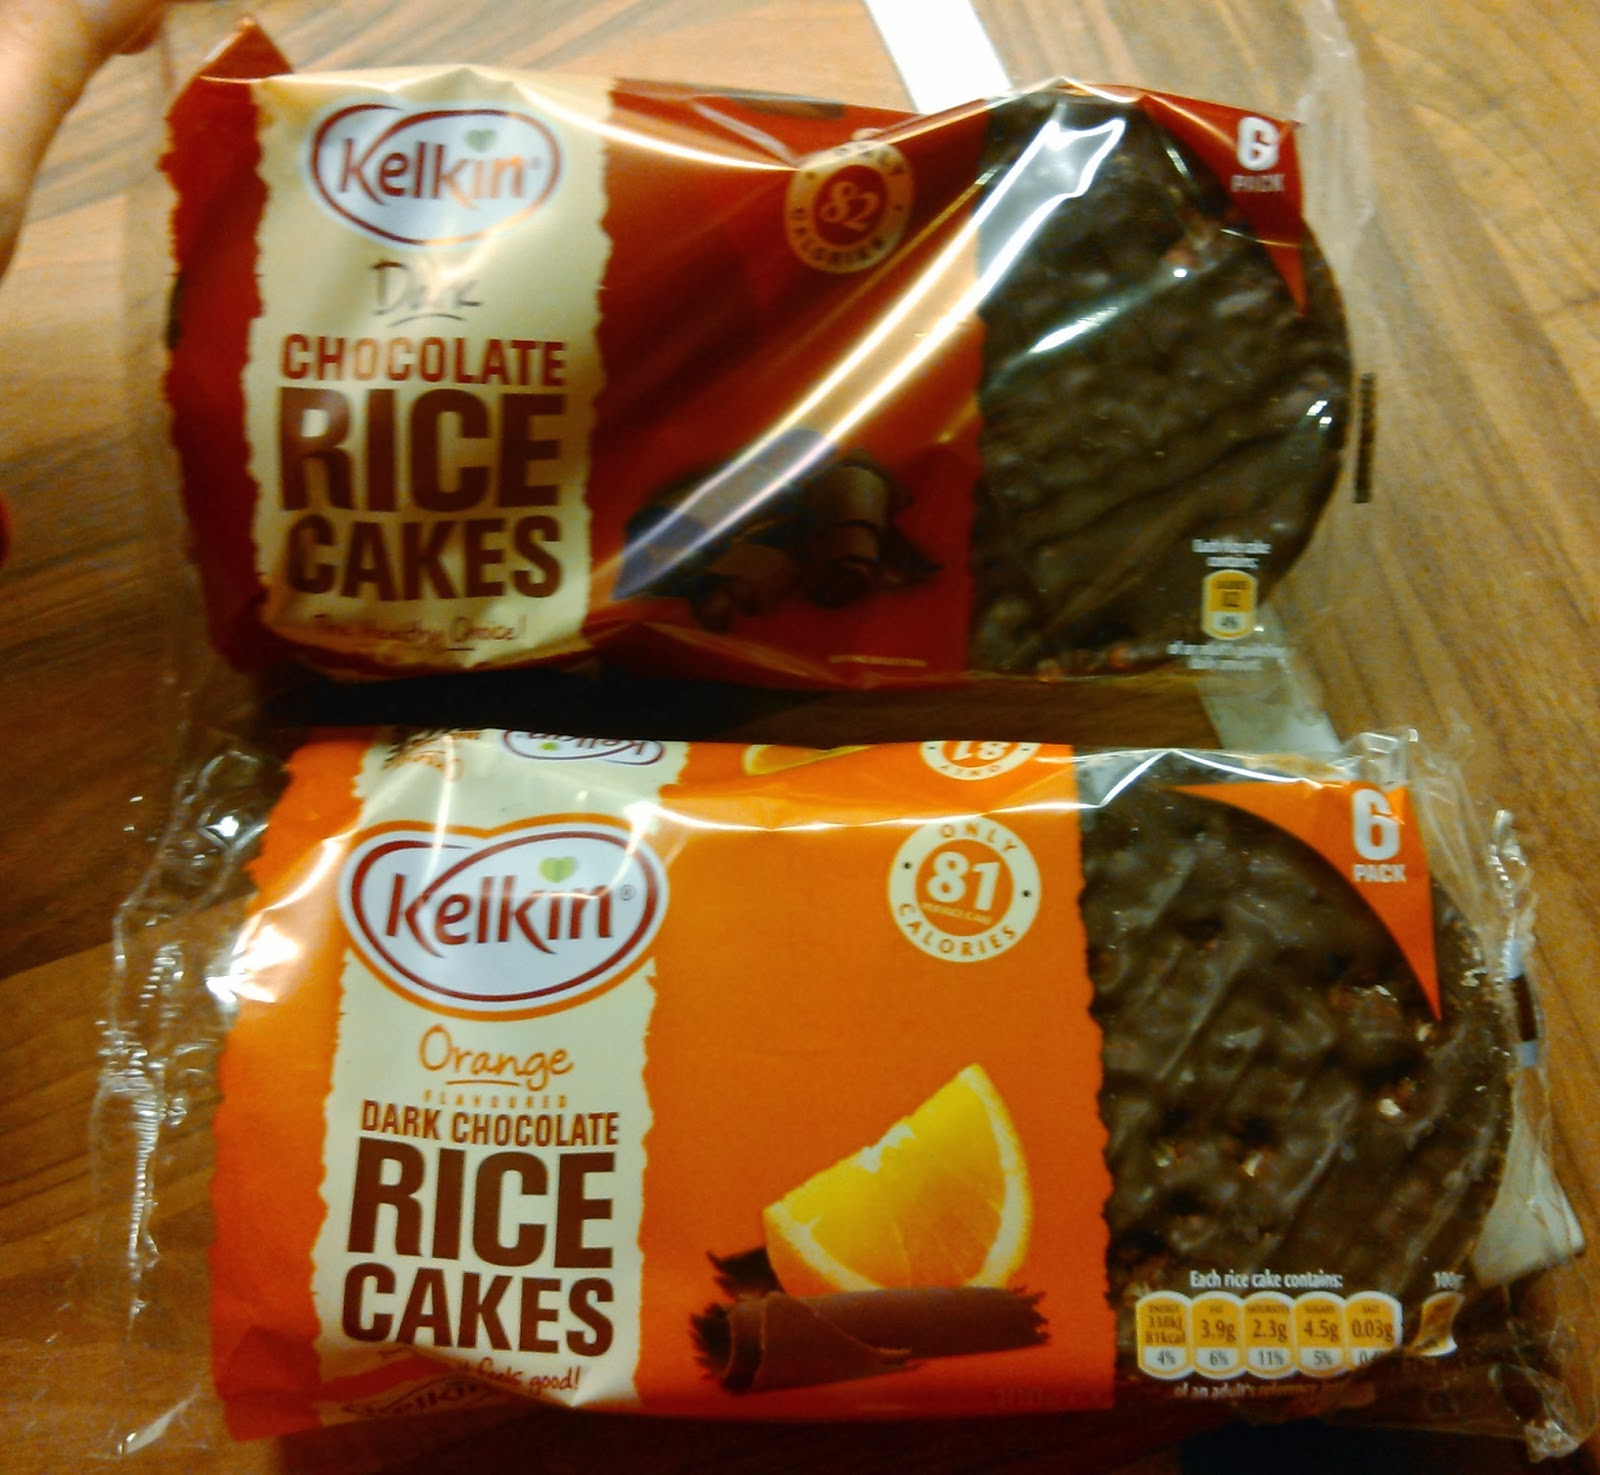 Chocolate Rice Cakes Lidl